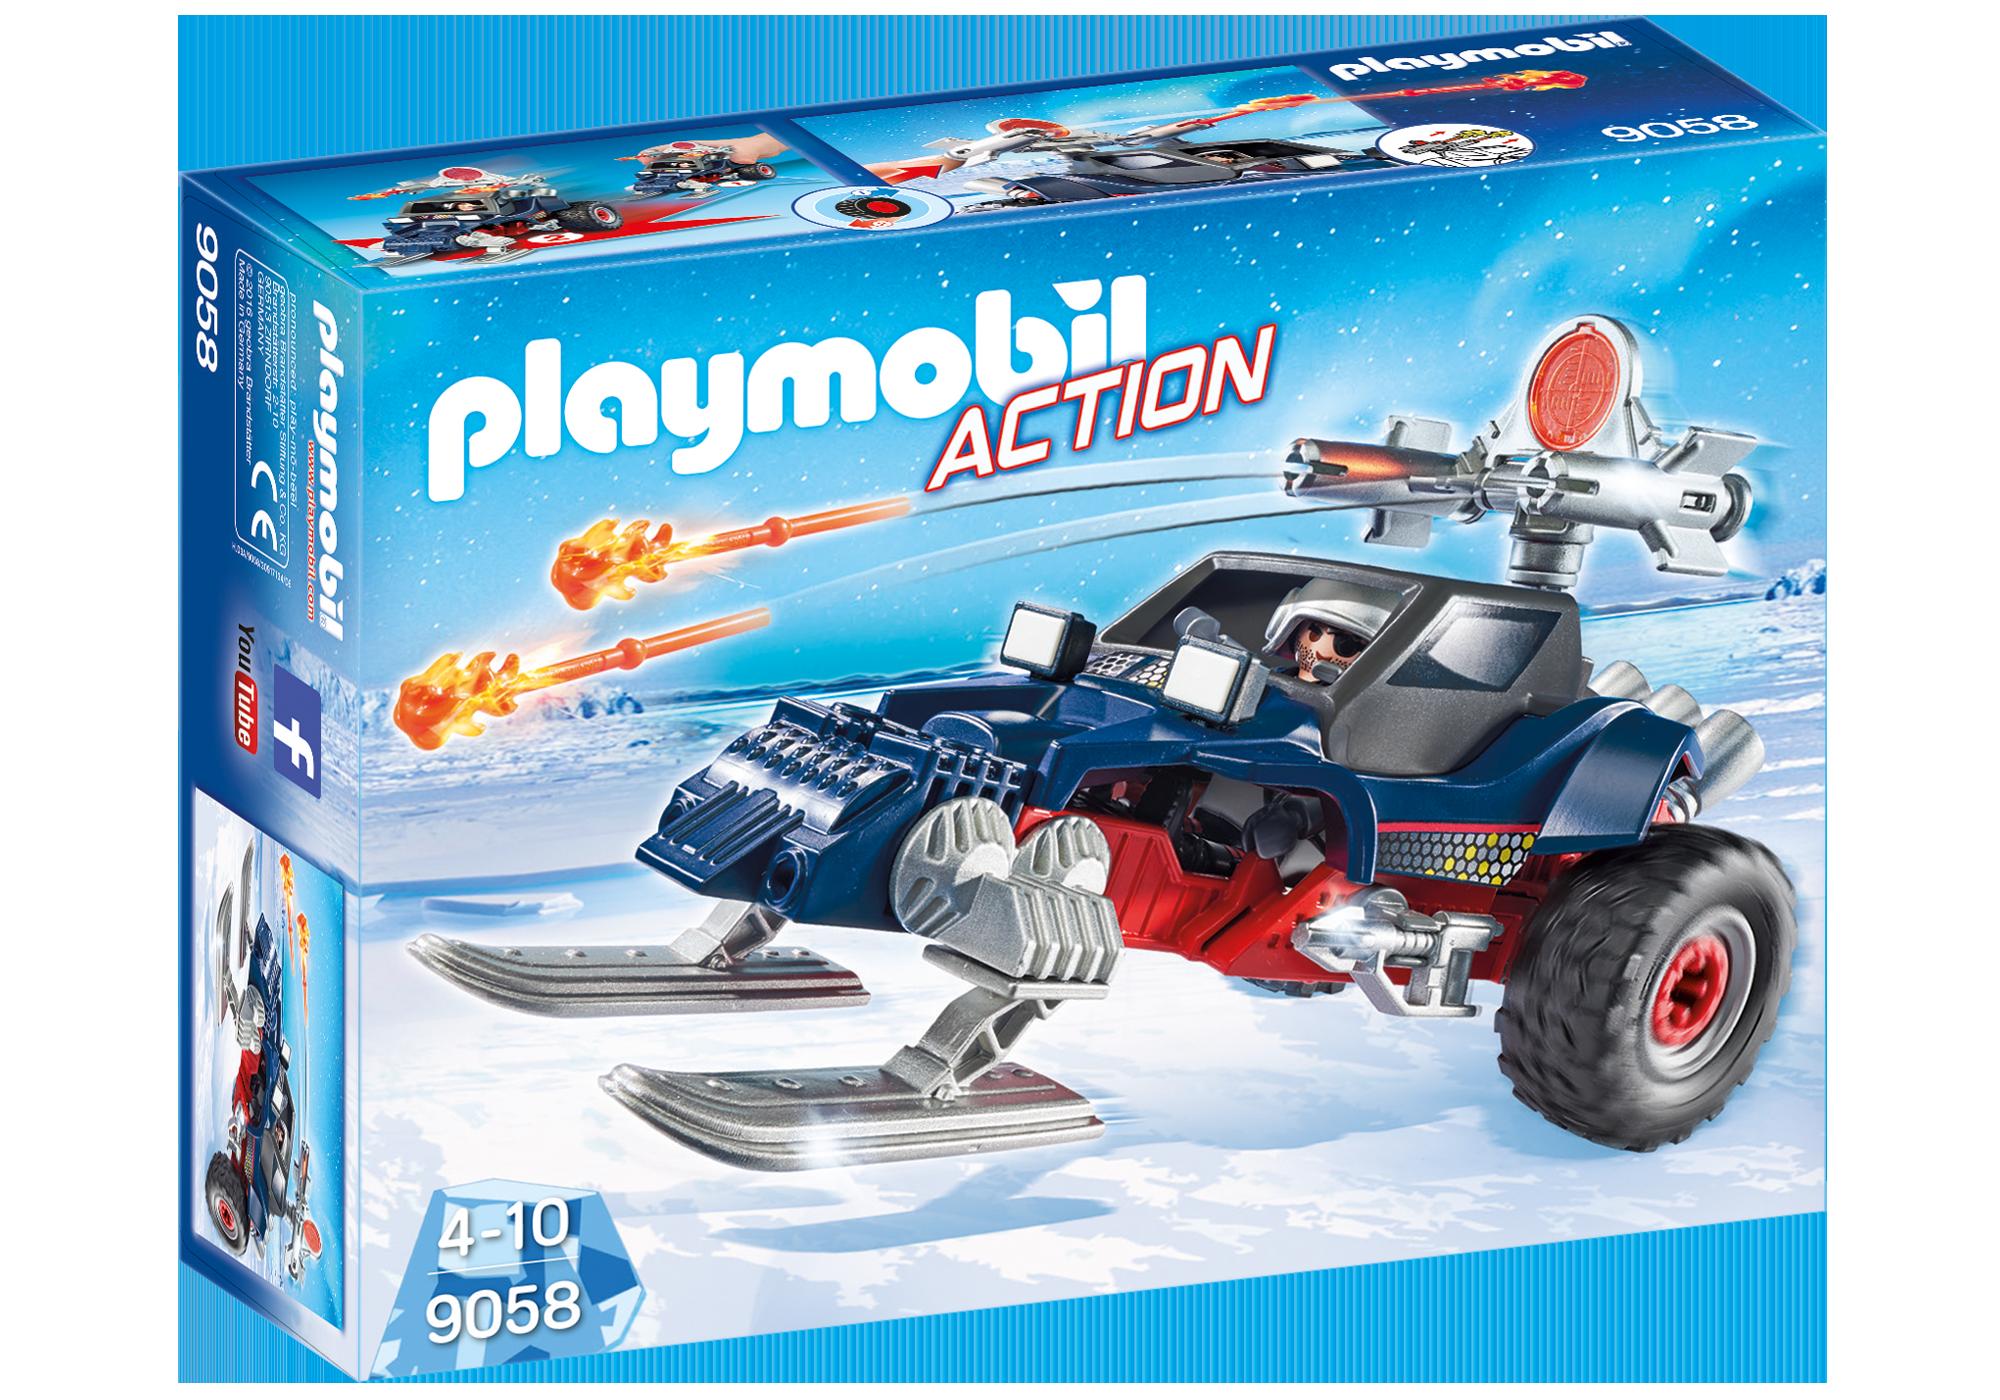 http://media.playmobil.com/i/playmobil/9058_product_box_front/Eispiraten-Racer